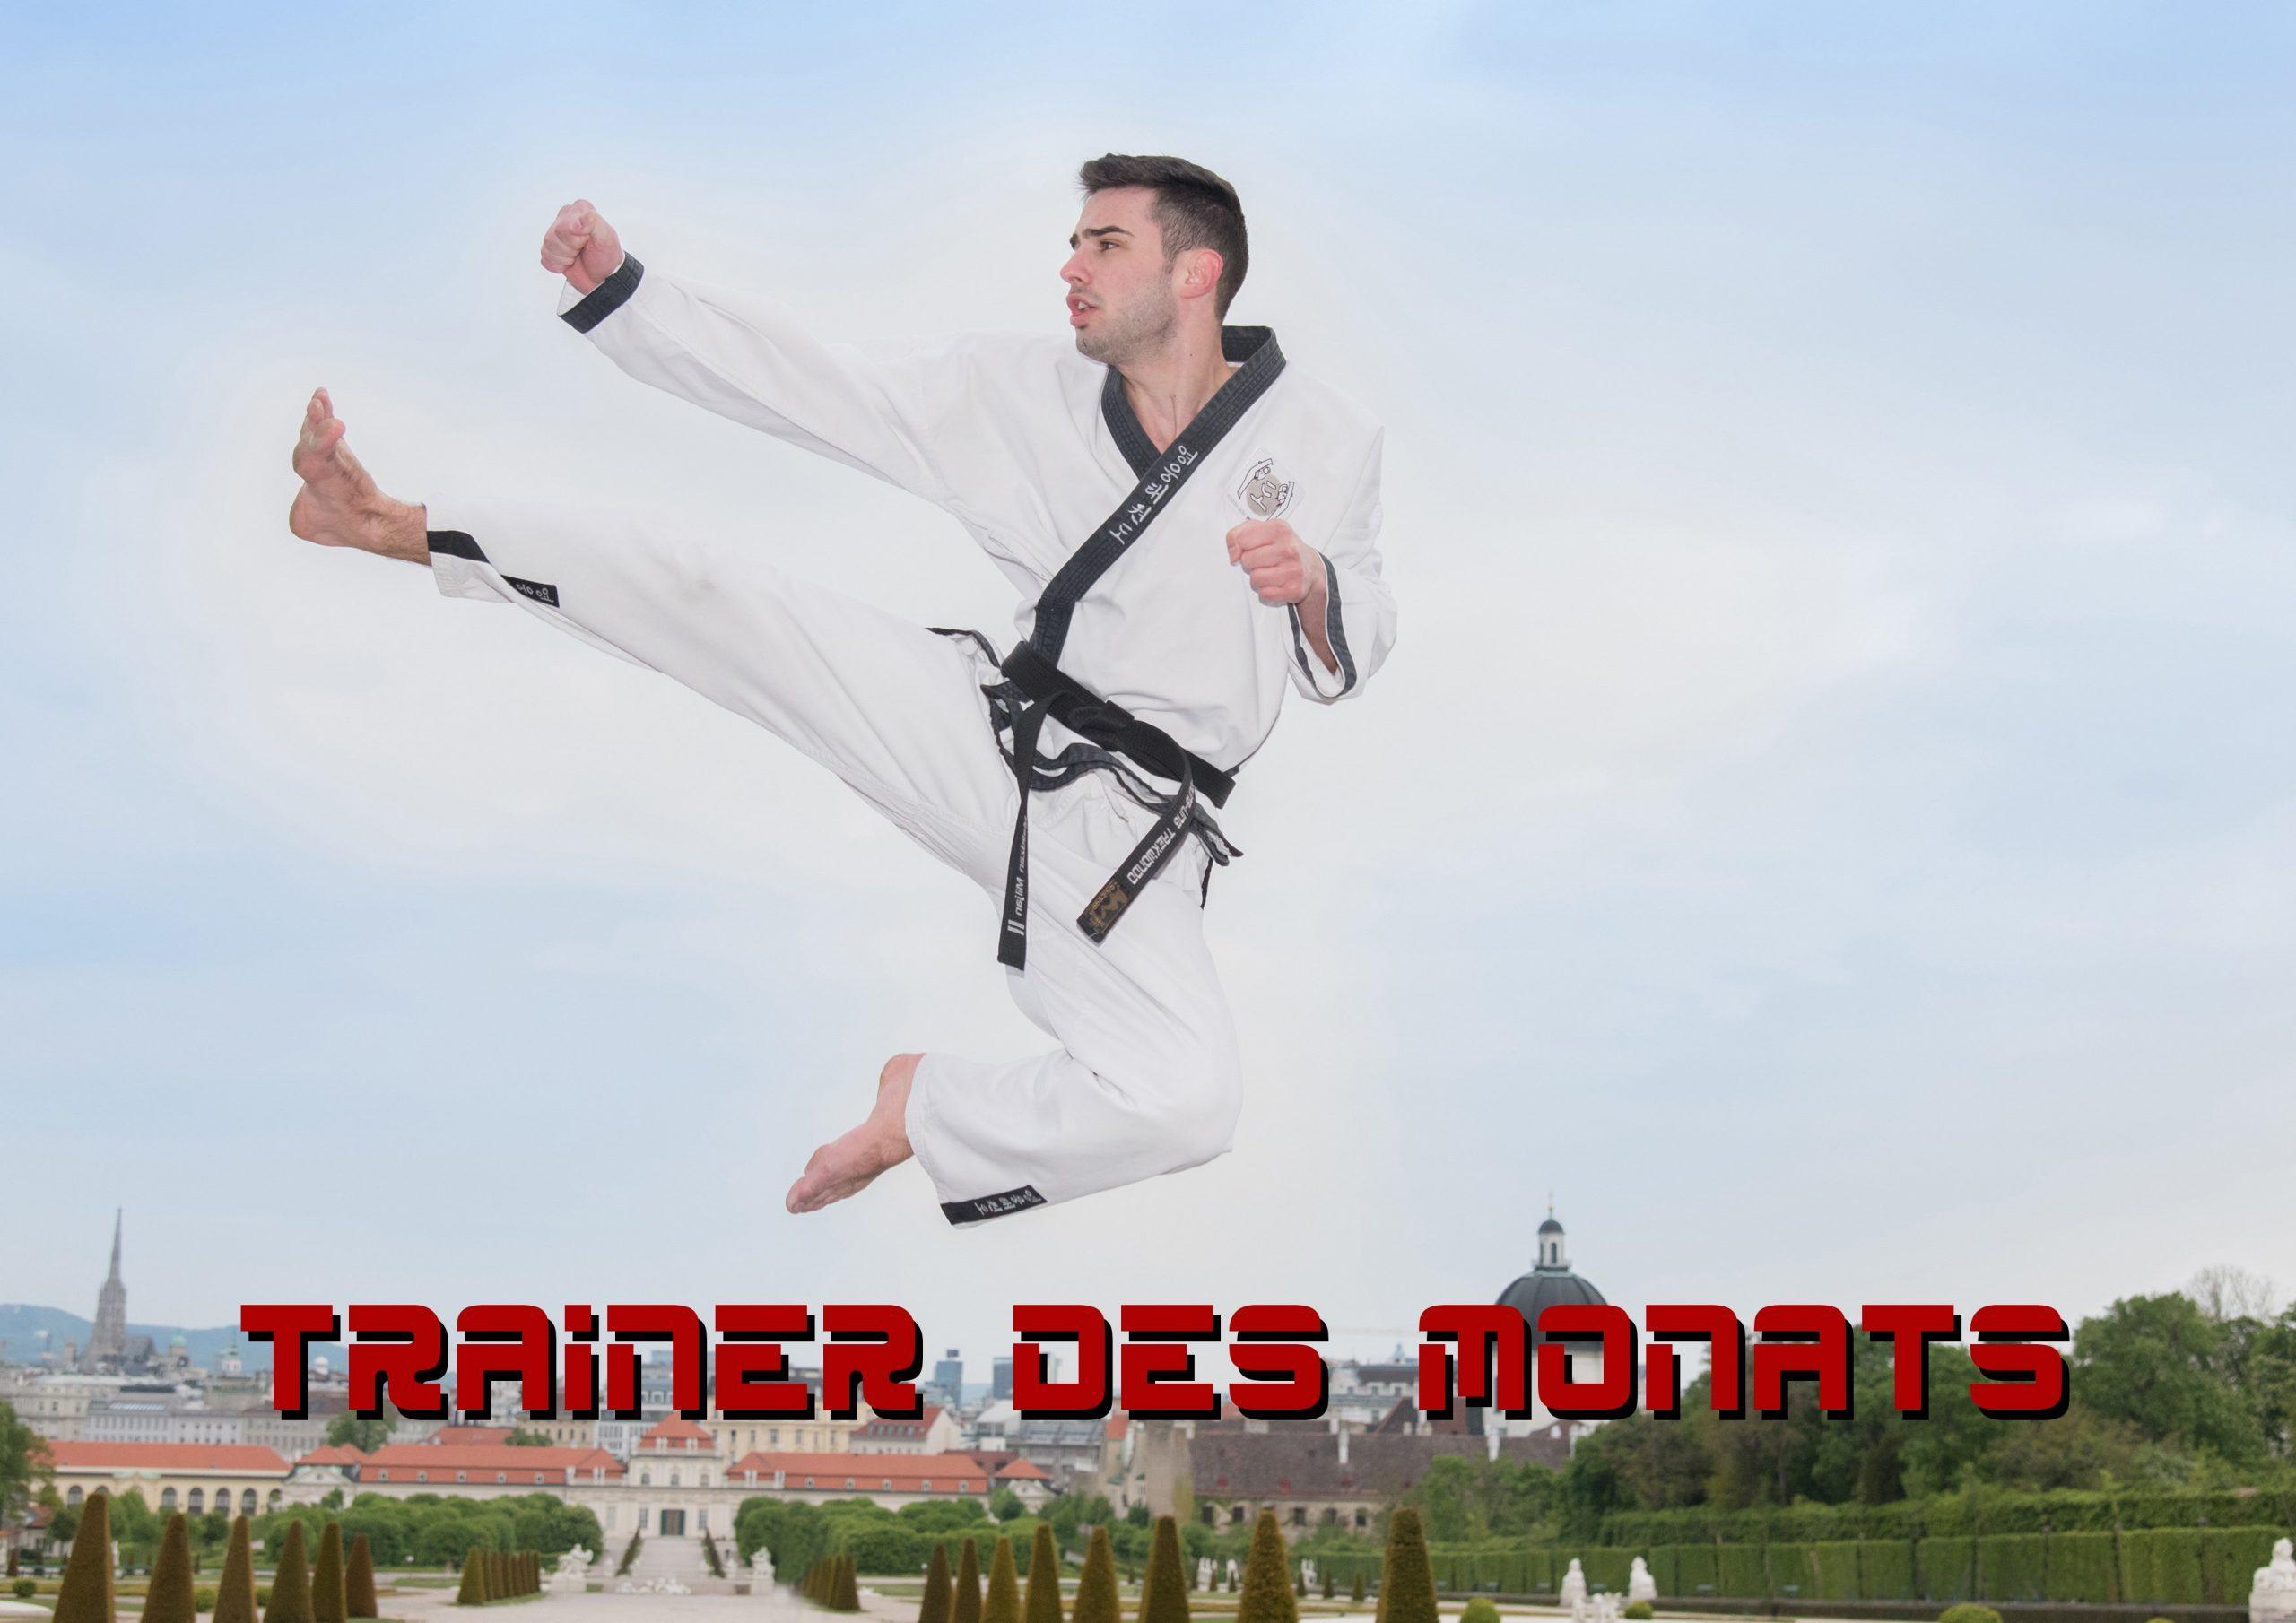 YOUNG-UNG Taekwondo Trainer des Monats Kampfsport Miljan Malidzan